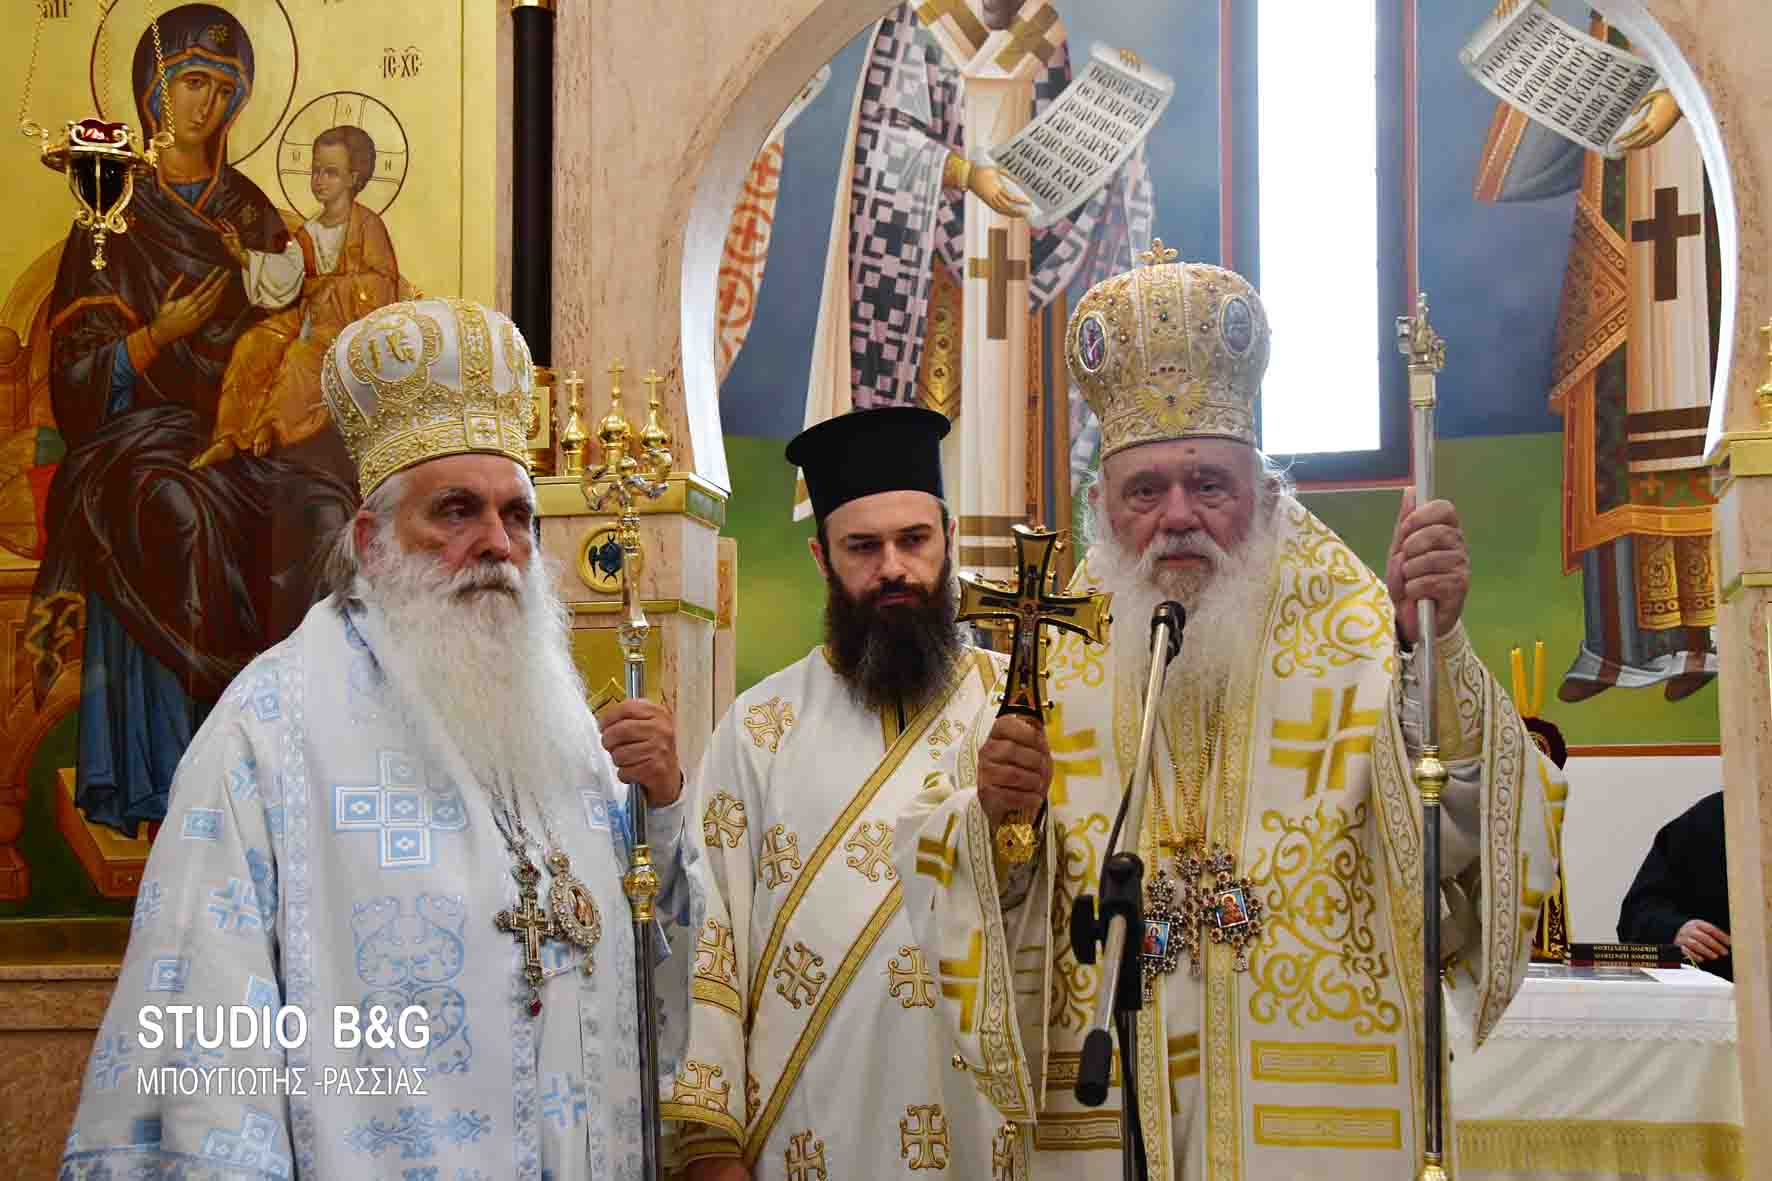 You are currently viewing Εγκαινιάστηκε από τον Αρχιεπίσκοπο Αθηνών Ιερώνυμο ο Ιερός Ναός του Αγίου Λουκά στο Ναύπλιο